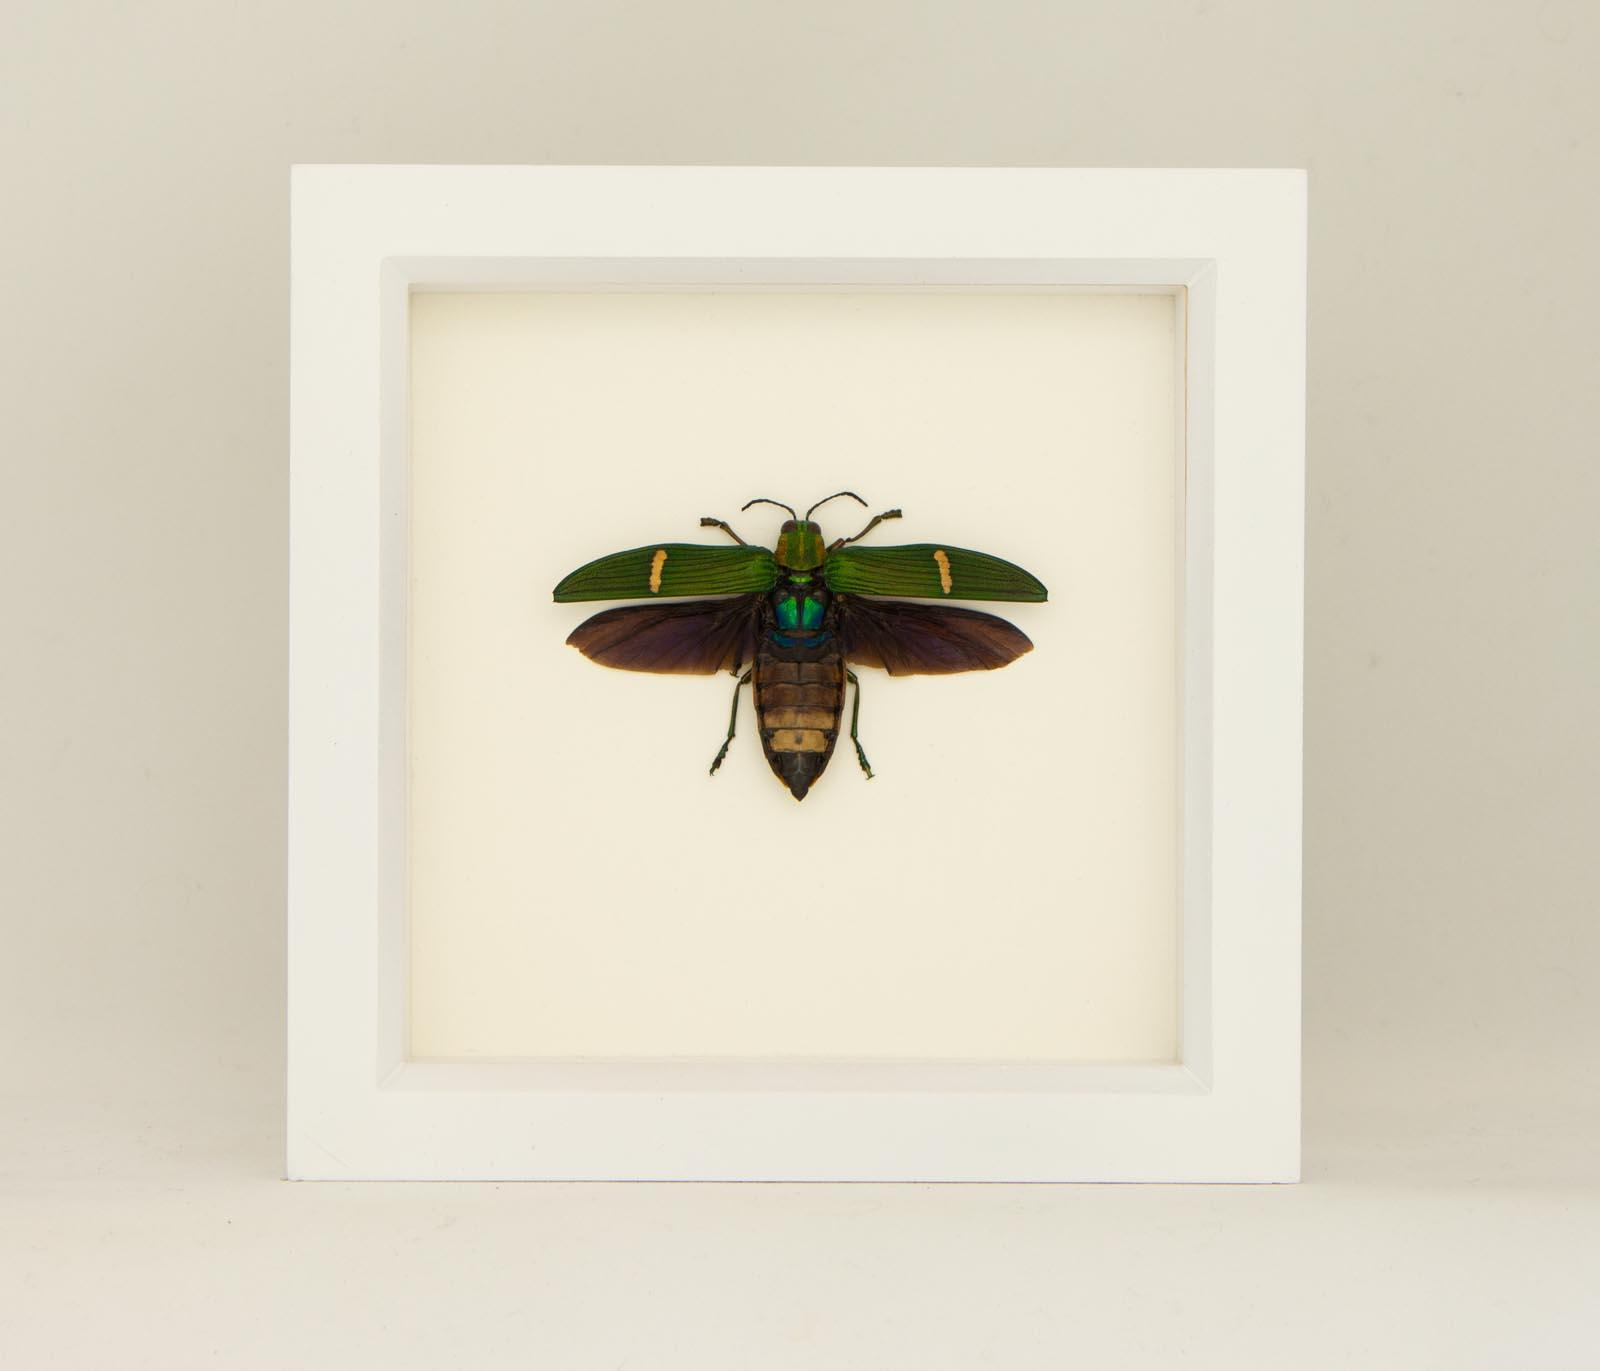 Real Catoxantha opulenta specimen. Jewel Beetle in Glass dome